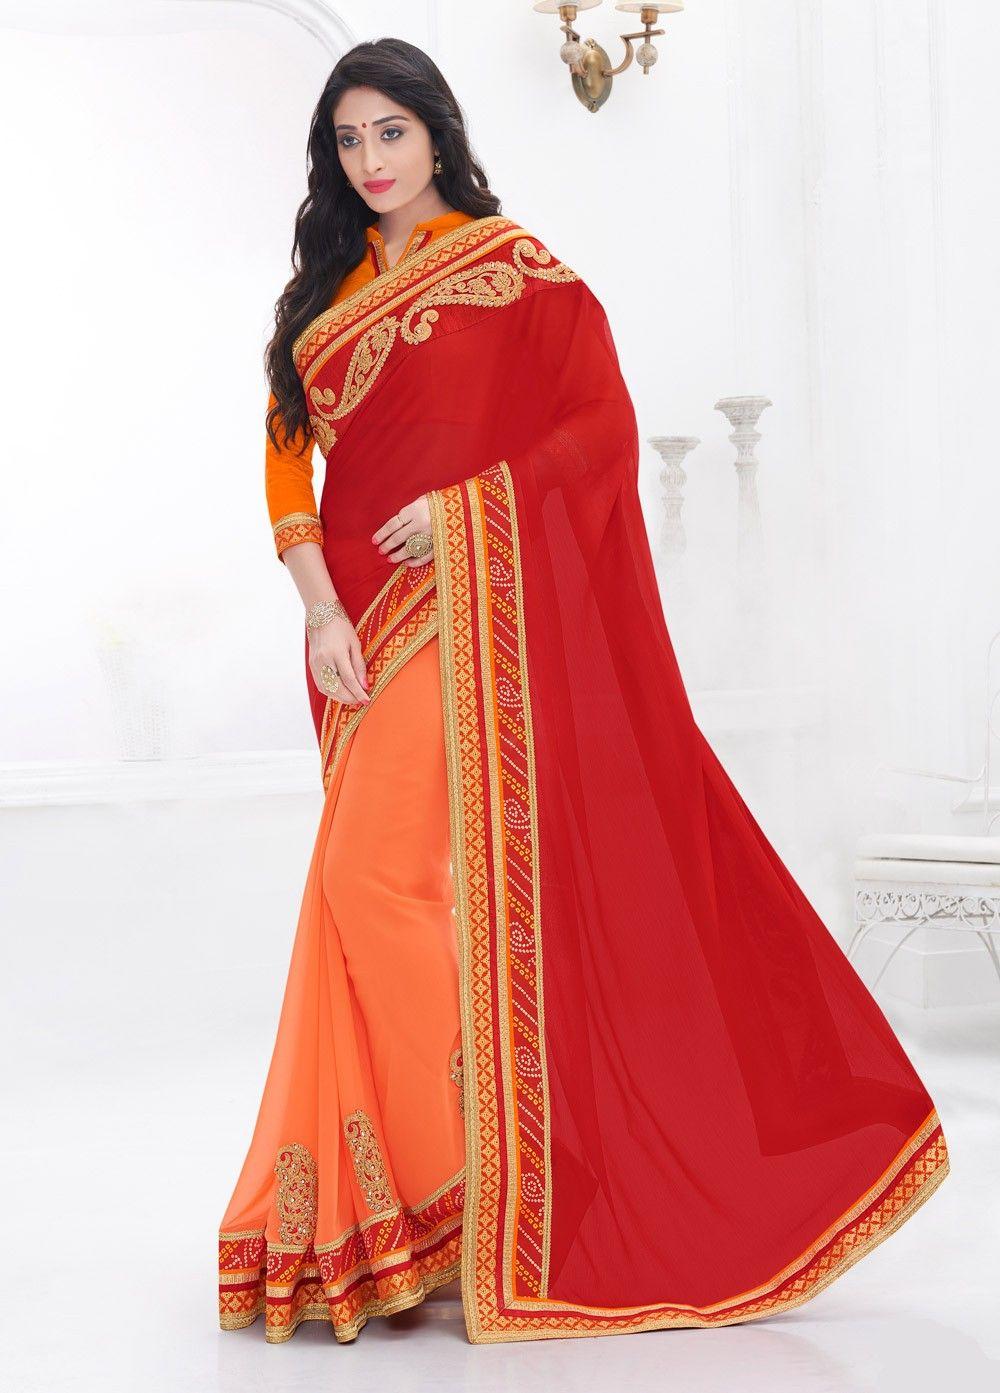 Classy Moss Chiffon Red and Orange #Casual Wear #Saree